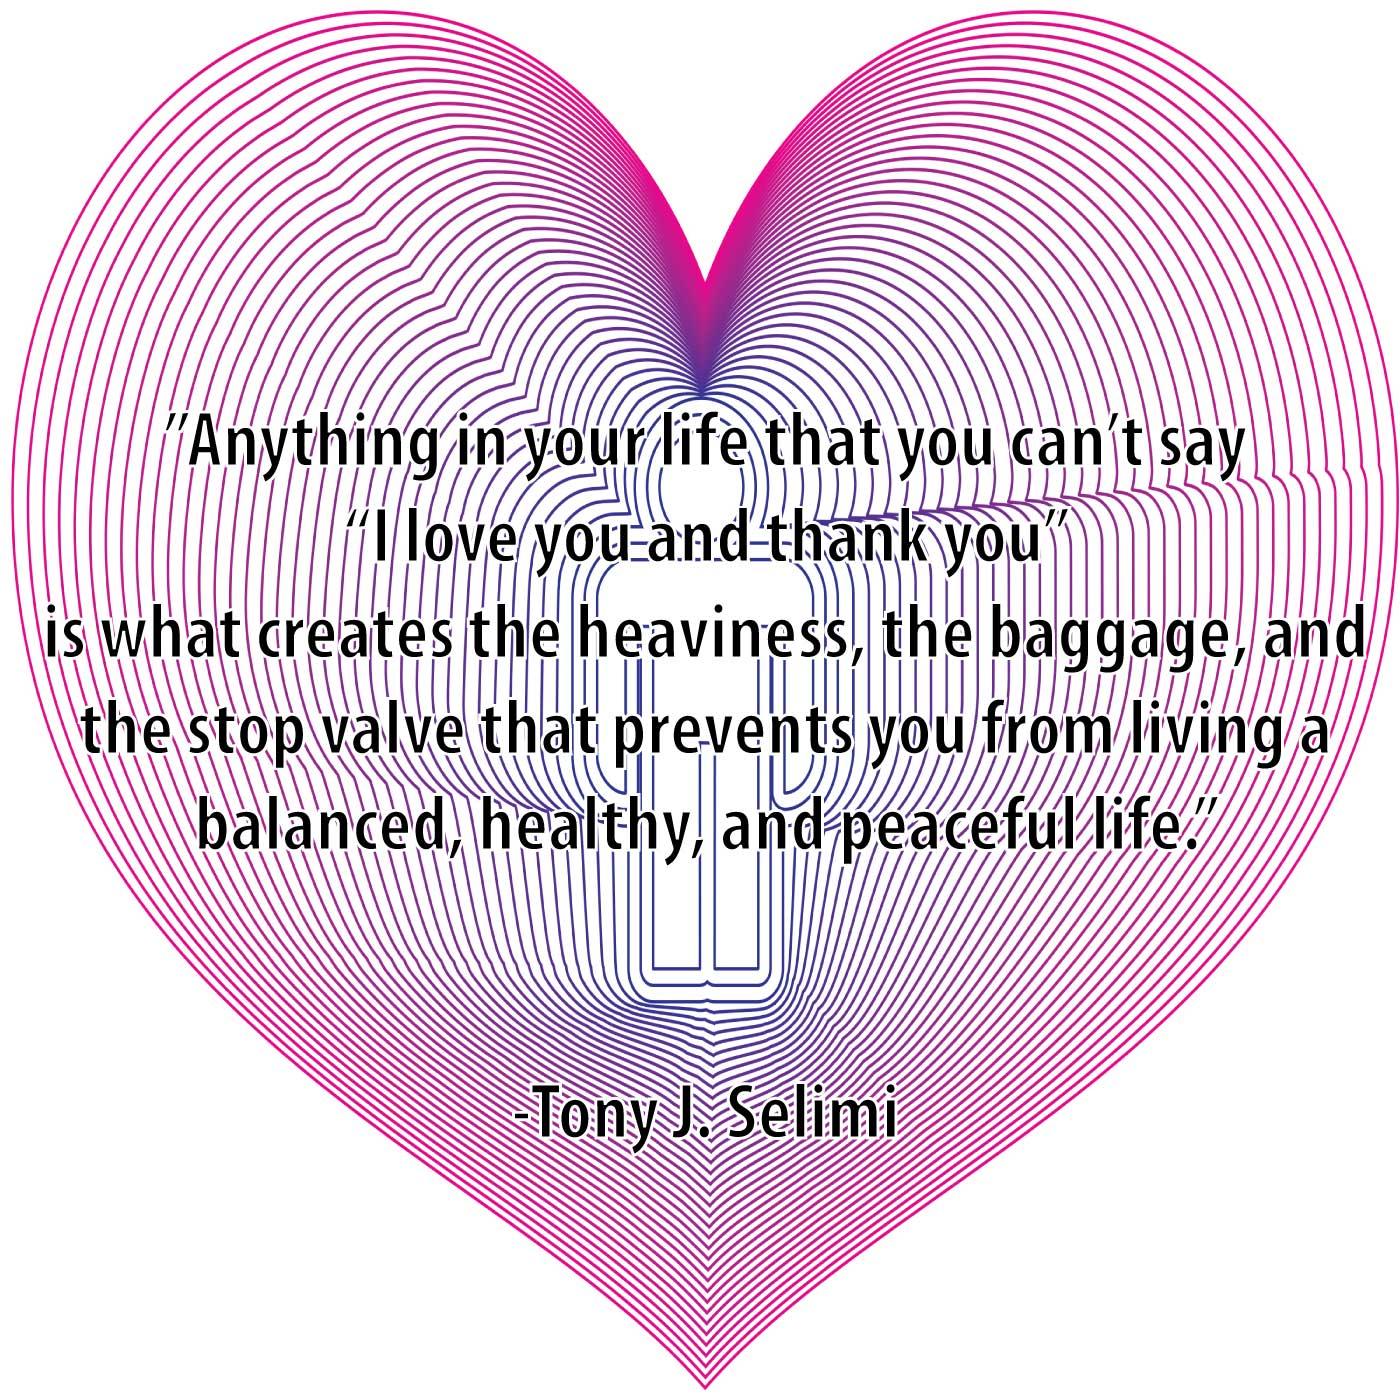 Thank-You-by-Tony-J-Selimi